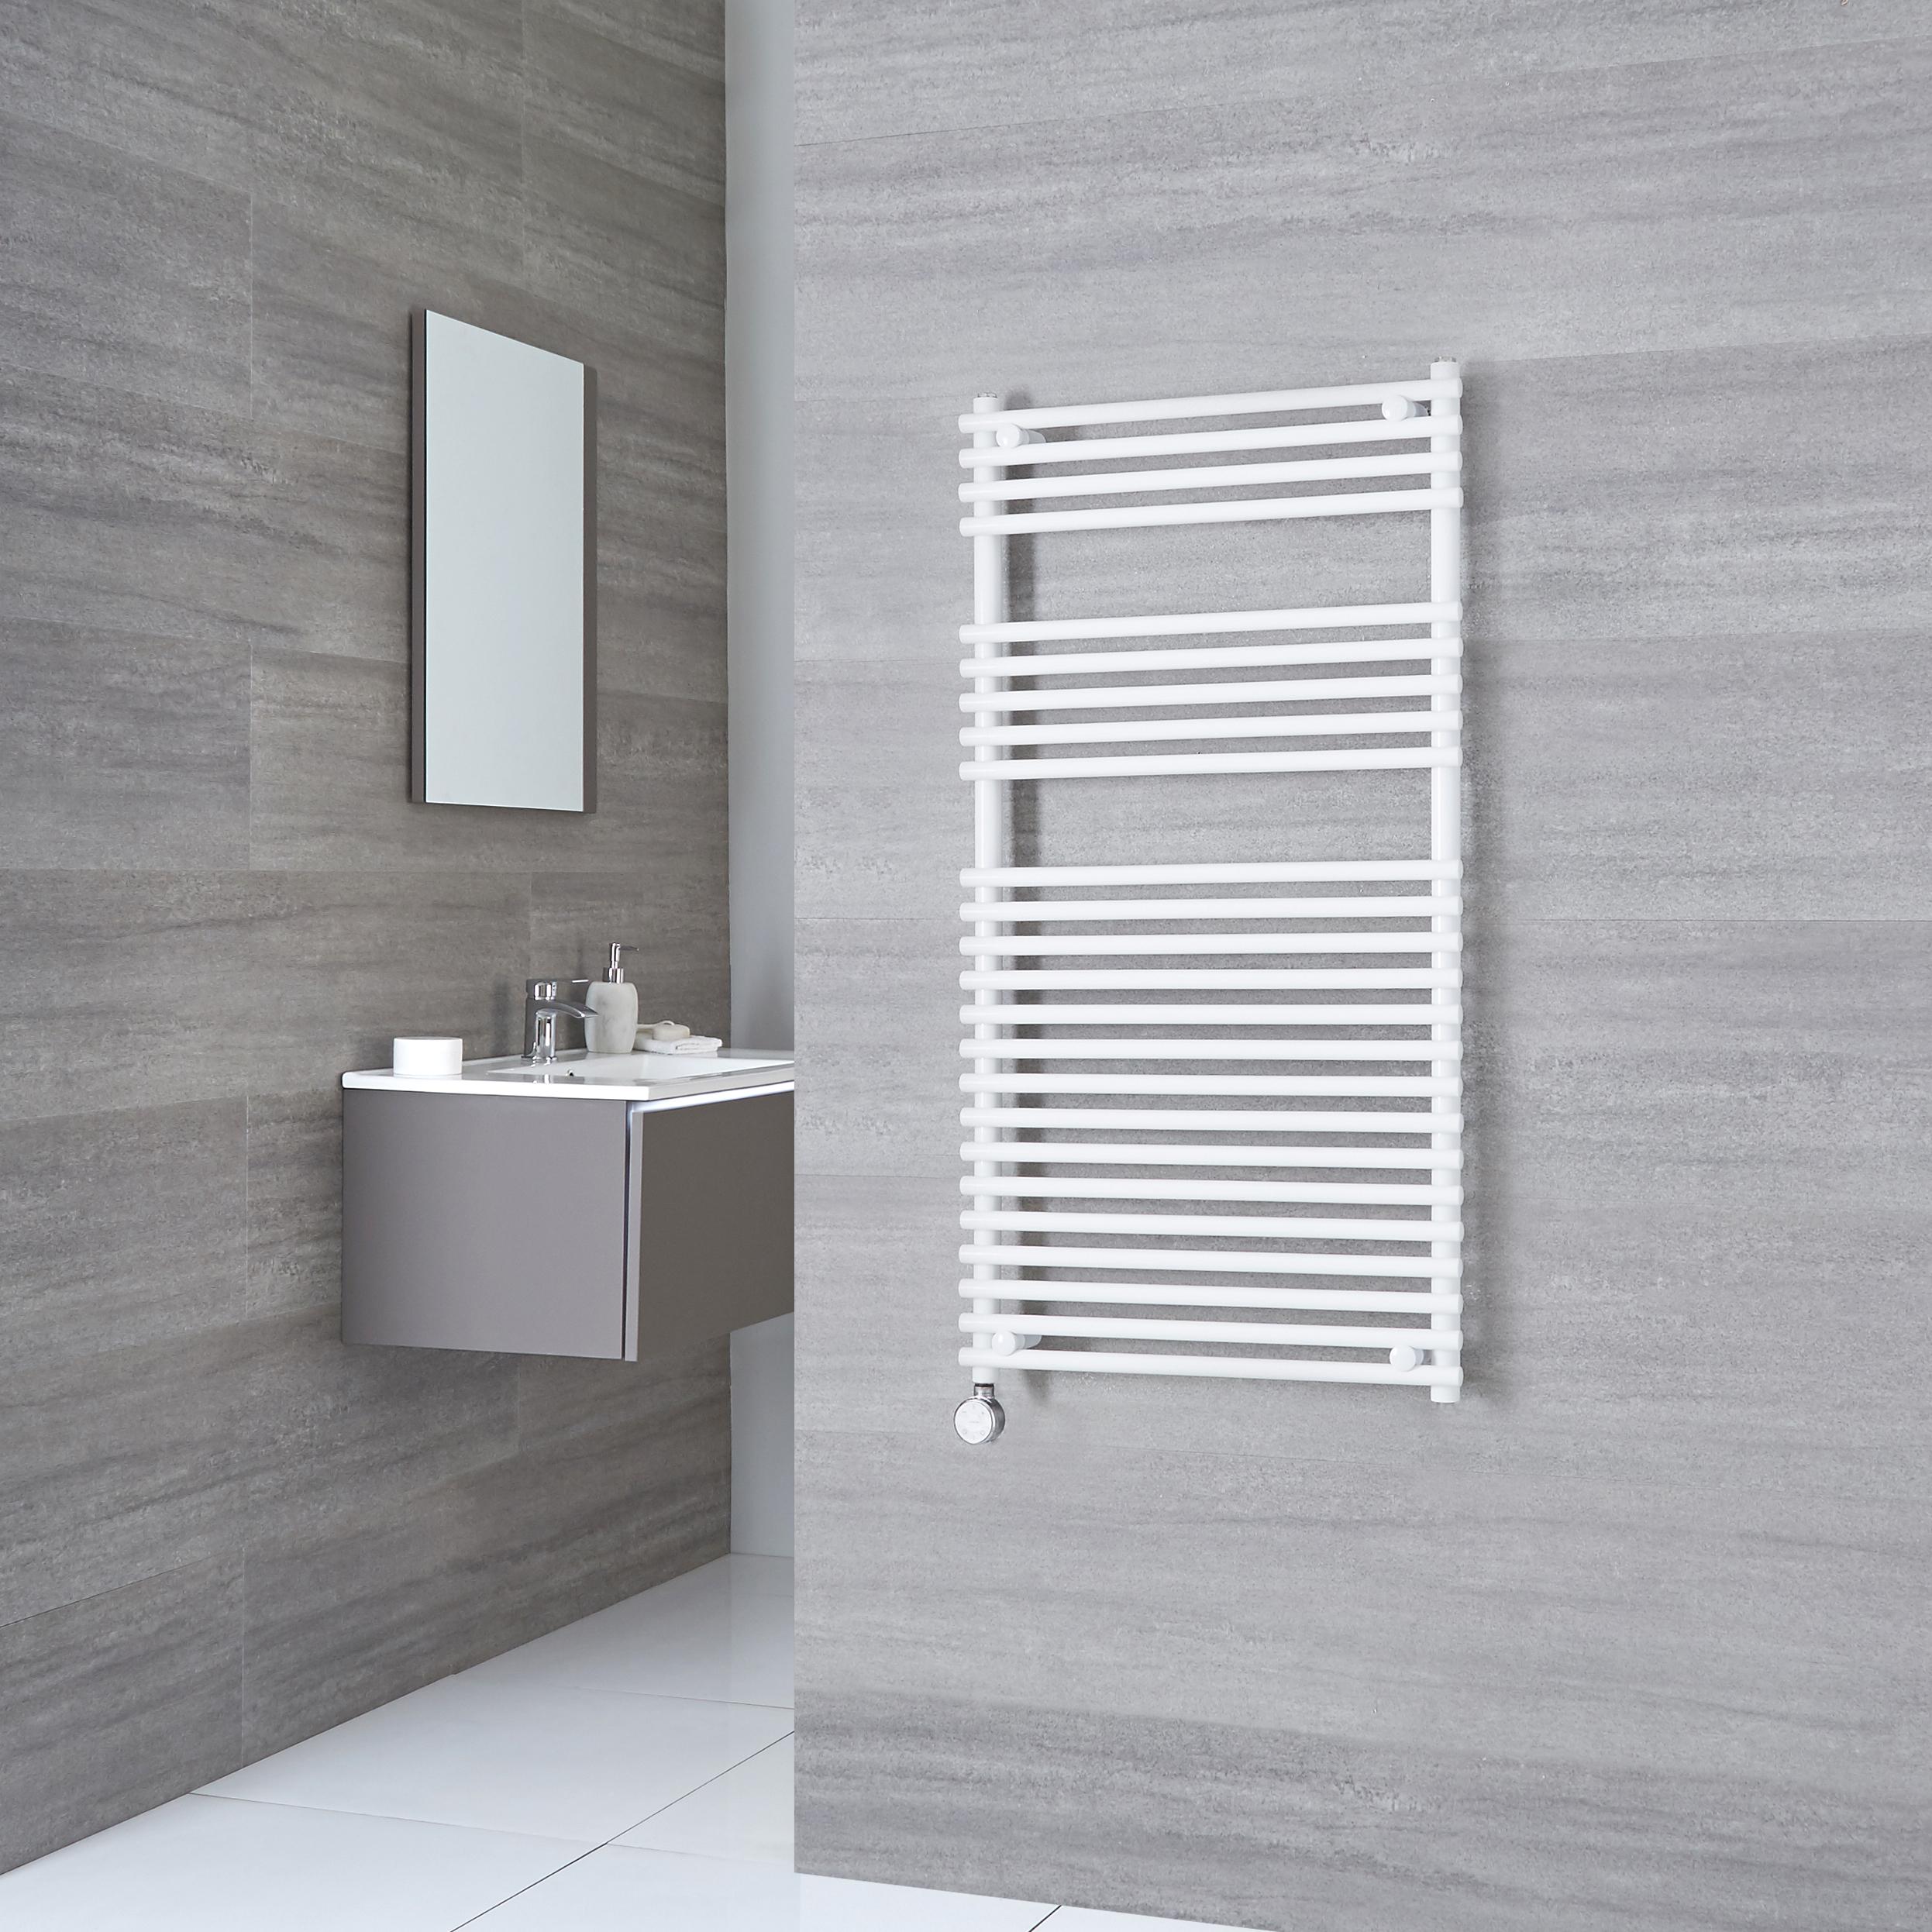 Kudox Harrogate Electric - White Flat Bar on Bar Heated Towel Rail - 1150mm x 450mm